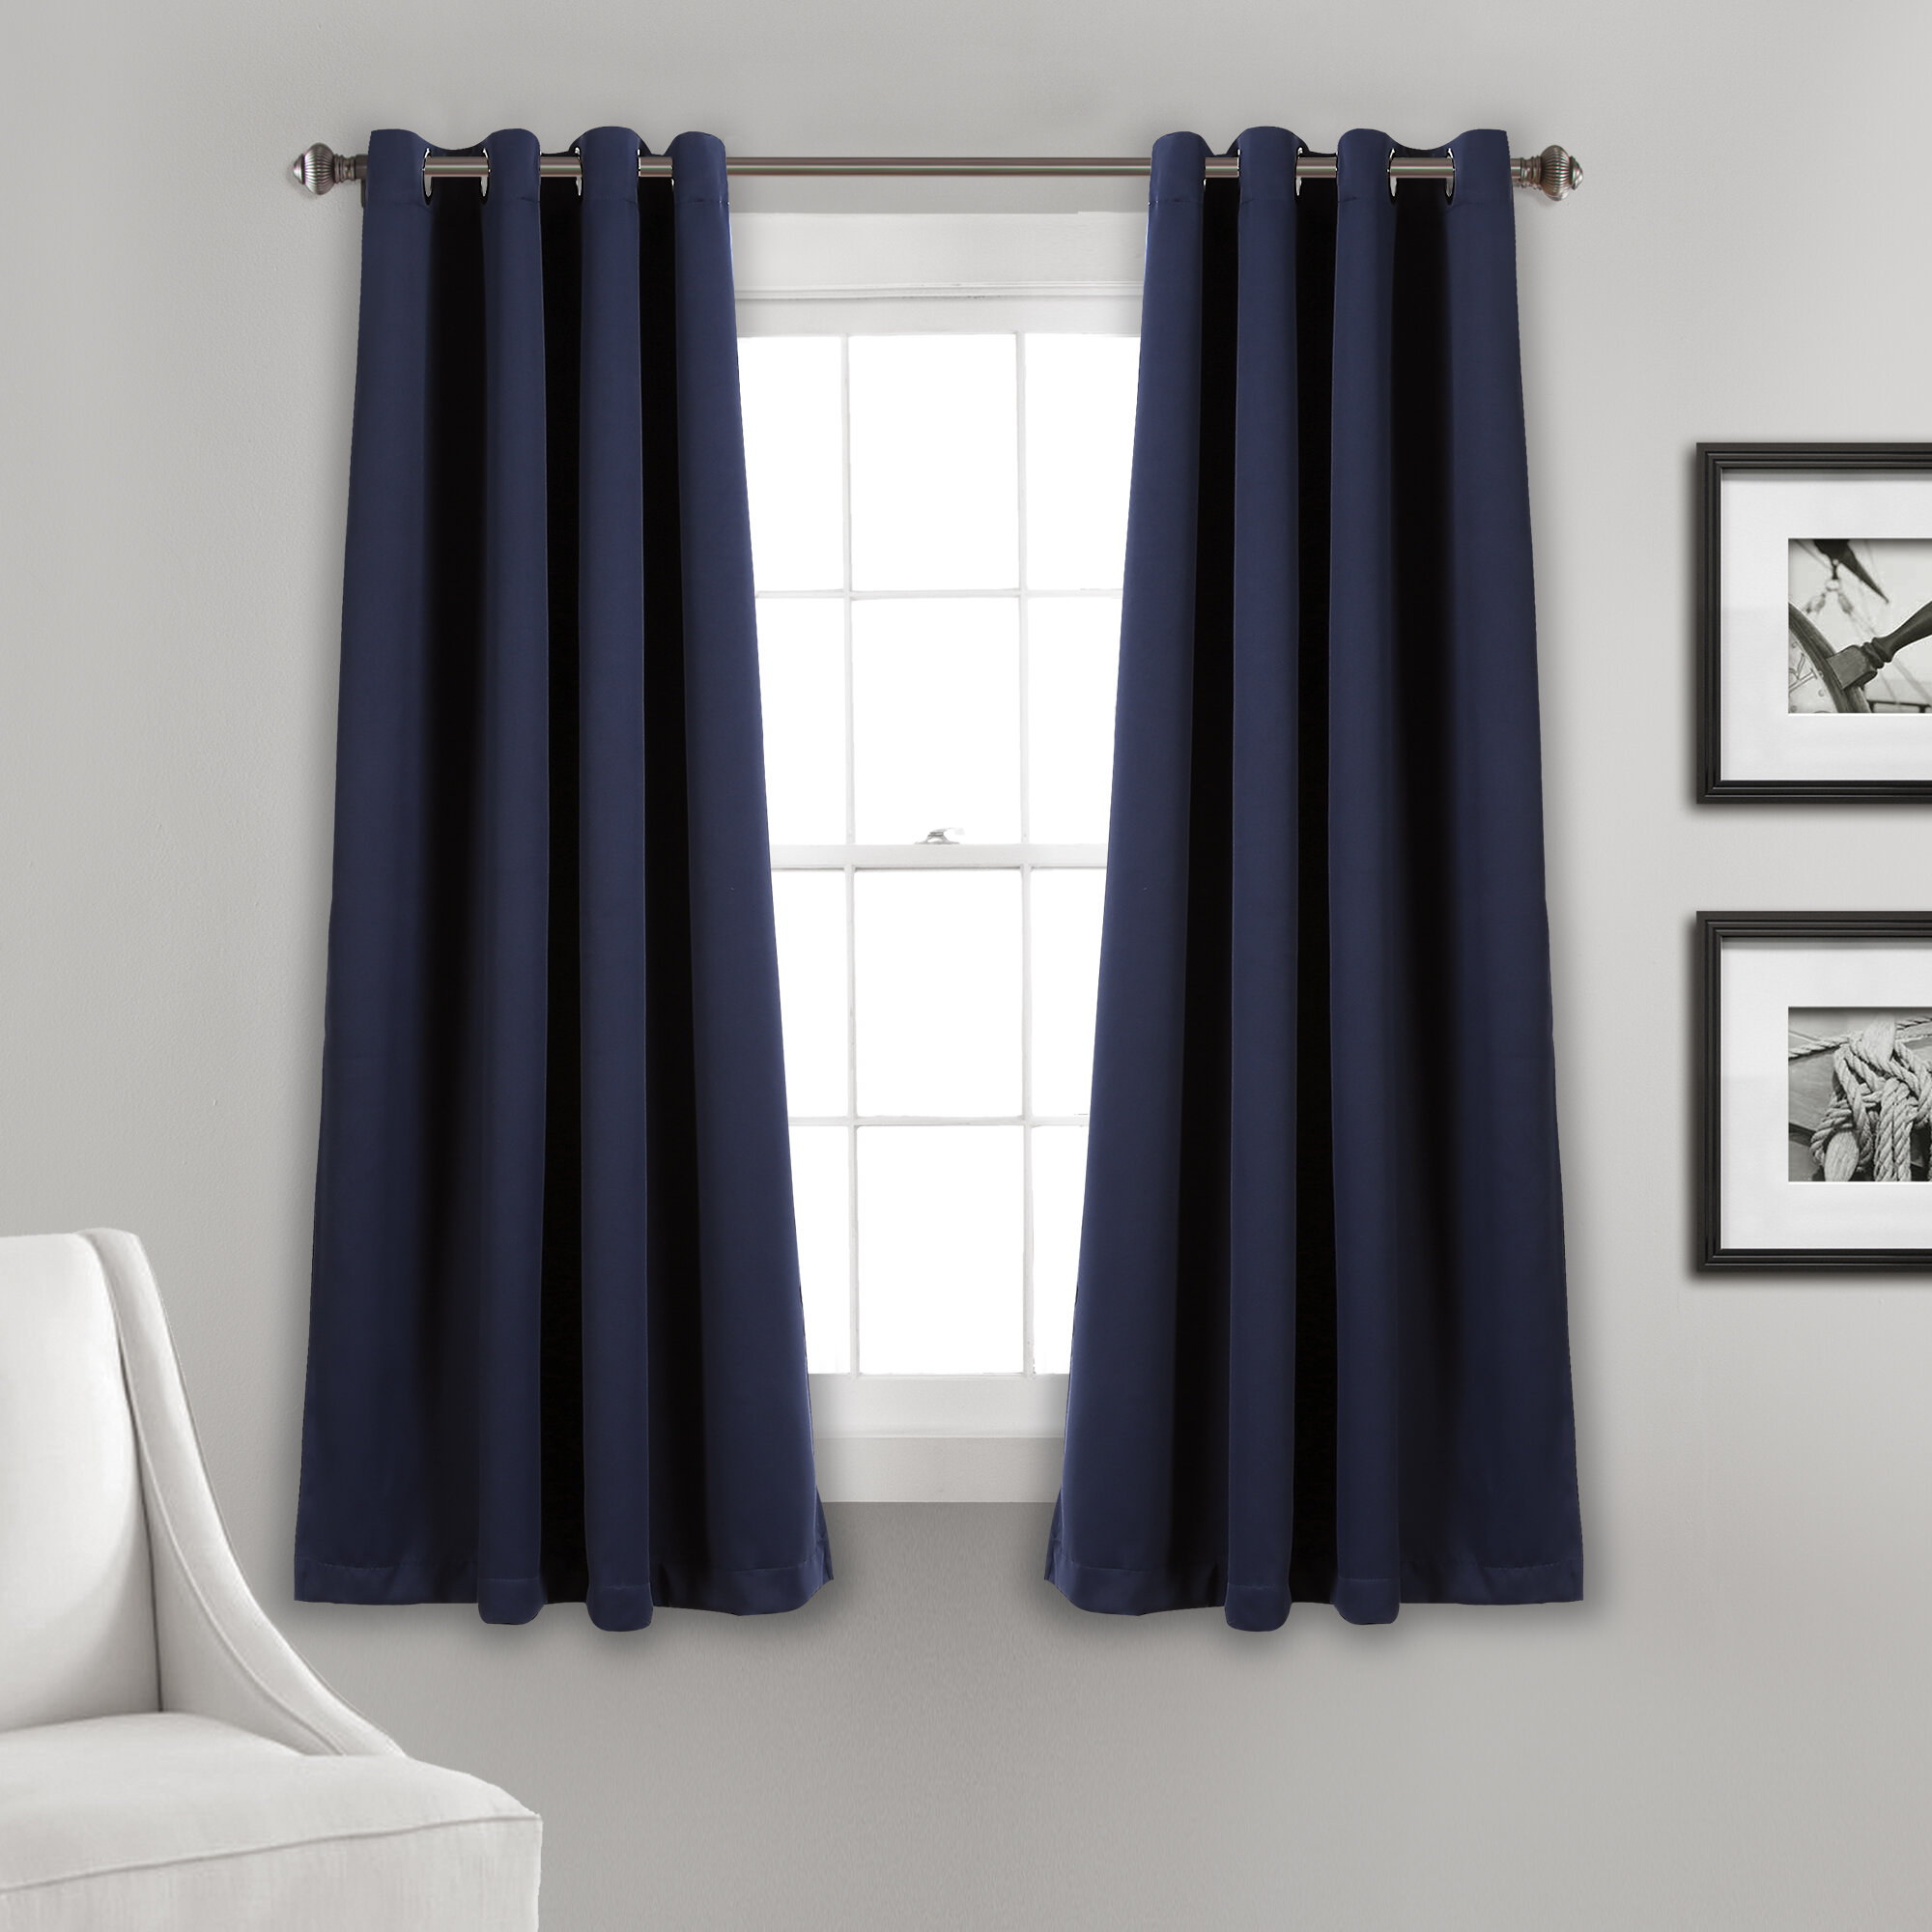 Blue White Curtains Drapes You Ll Love In 2021 Wayfair